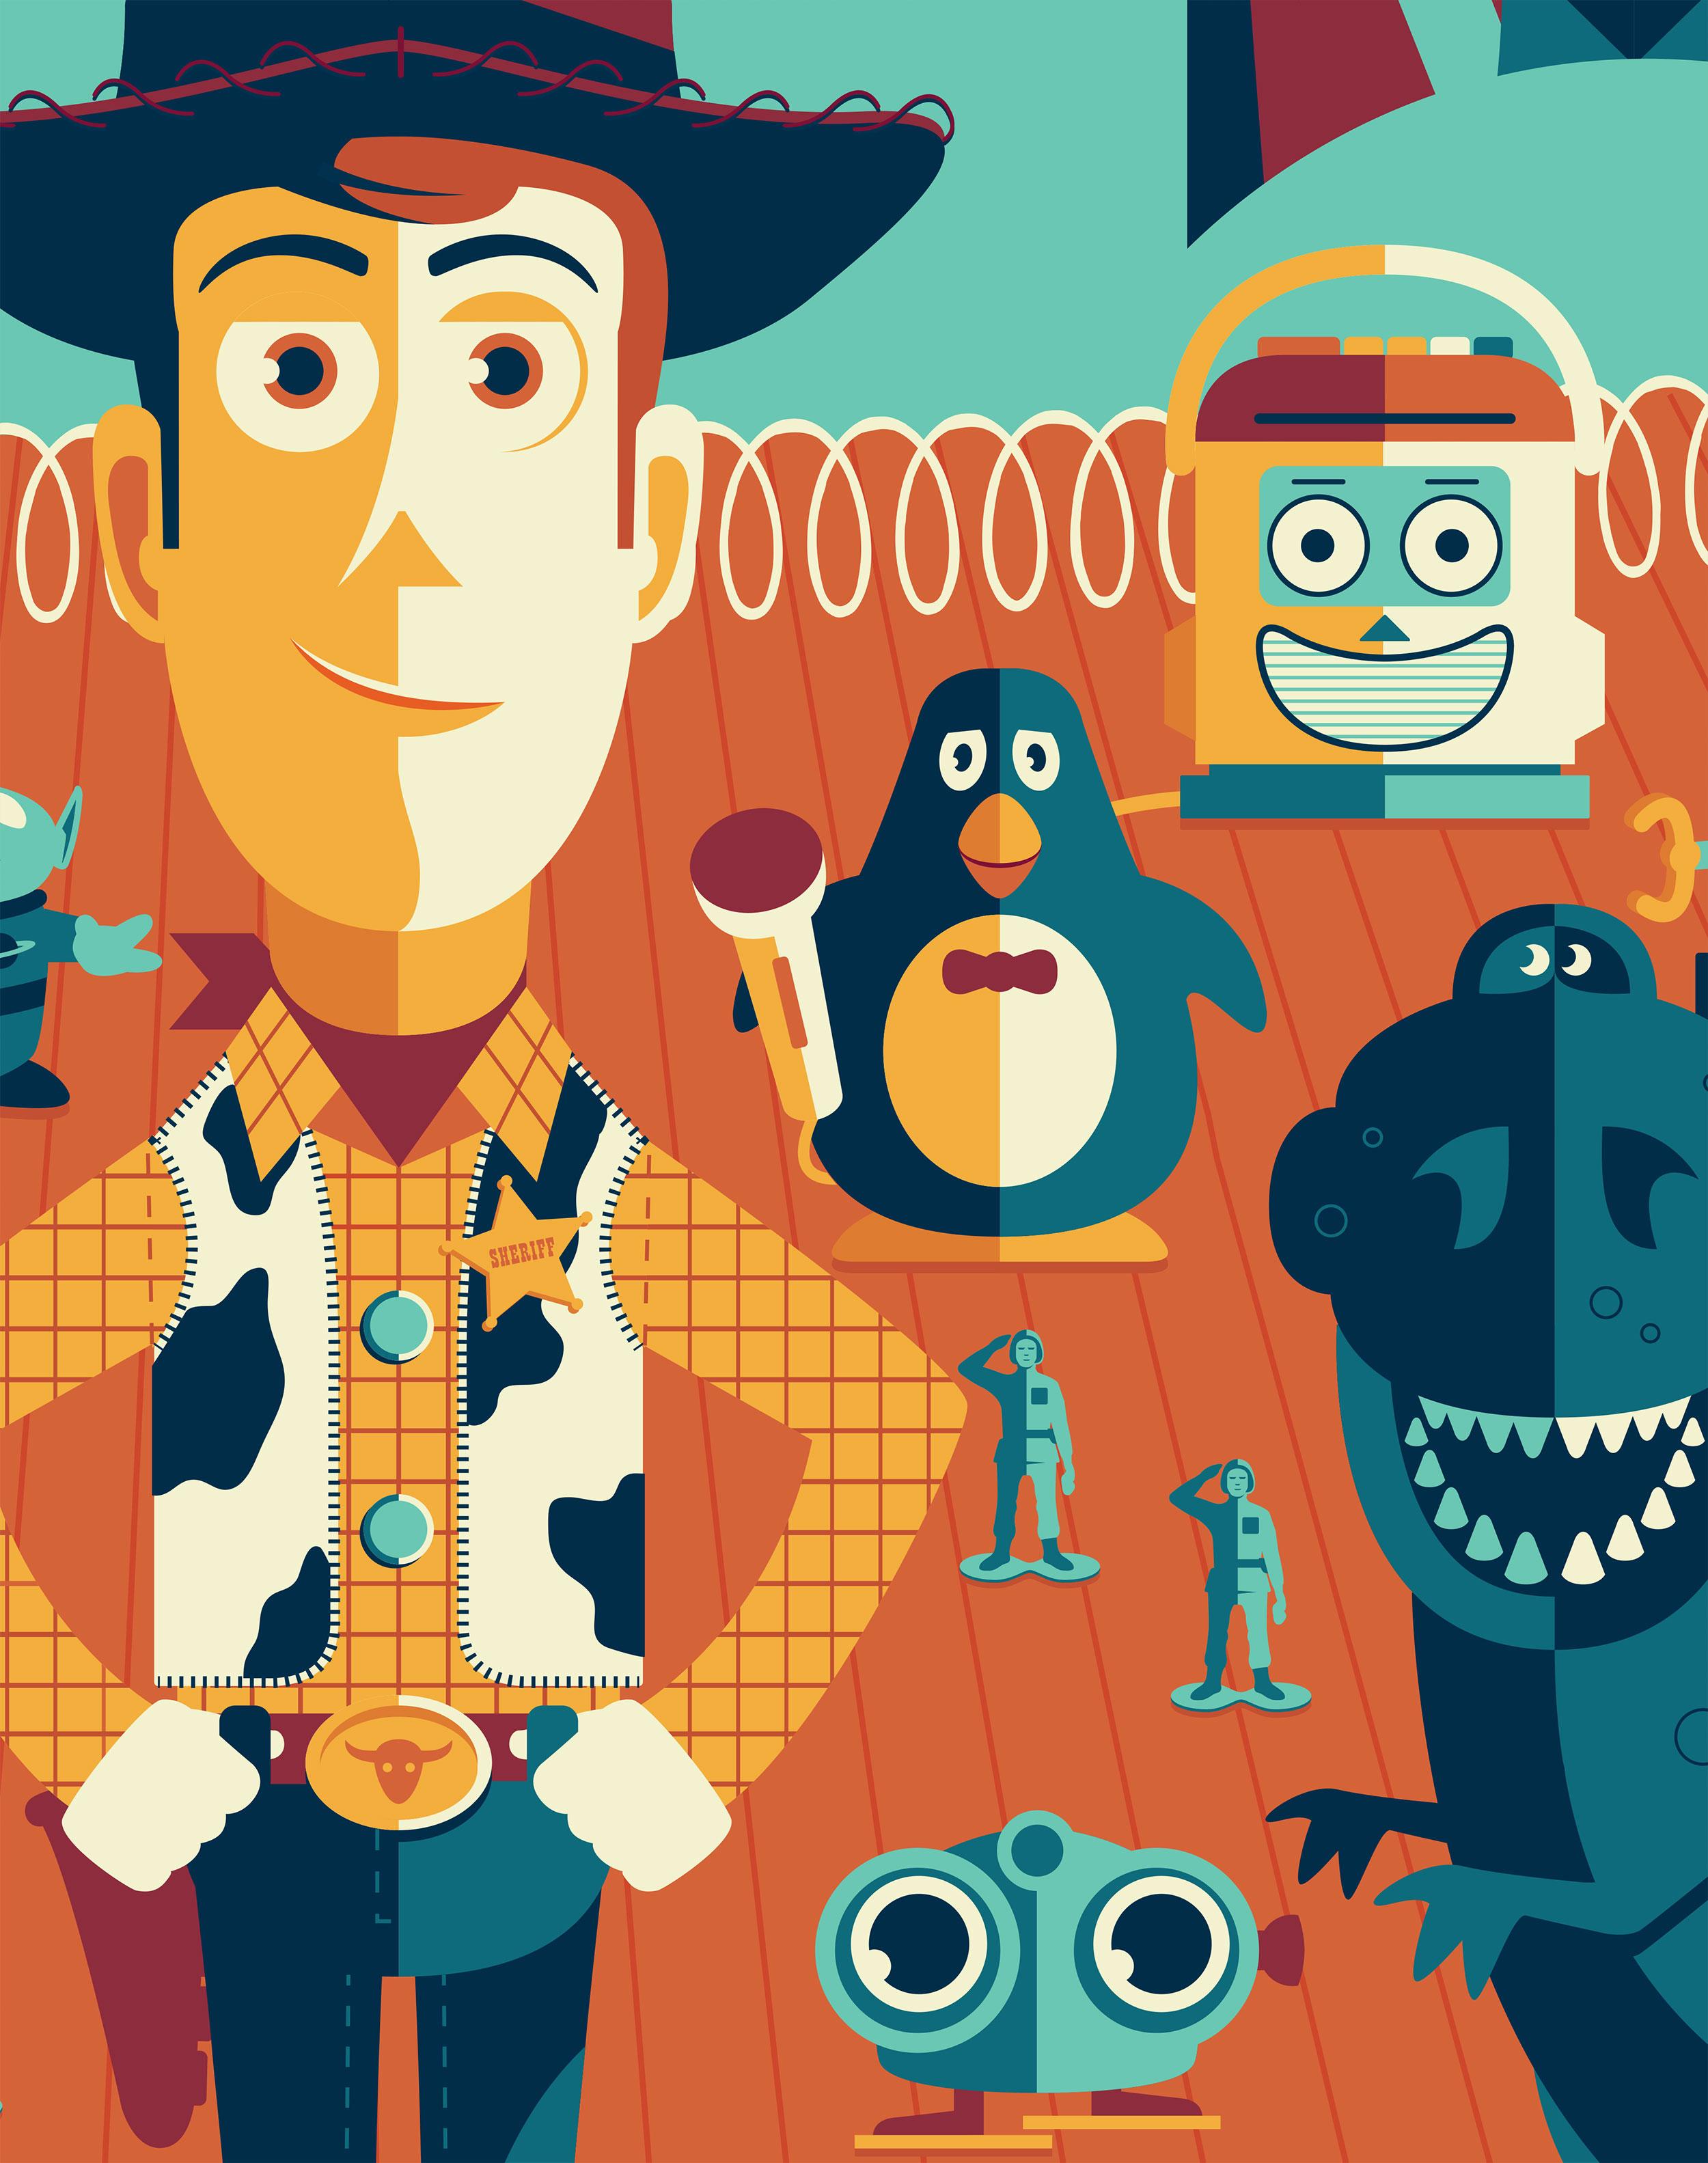 Illustrations_Posters_mockup_toystoryb.jpg